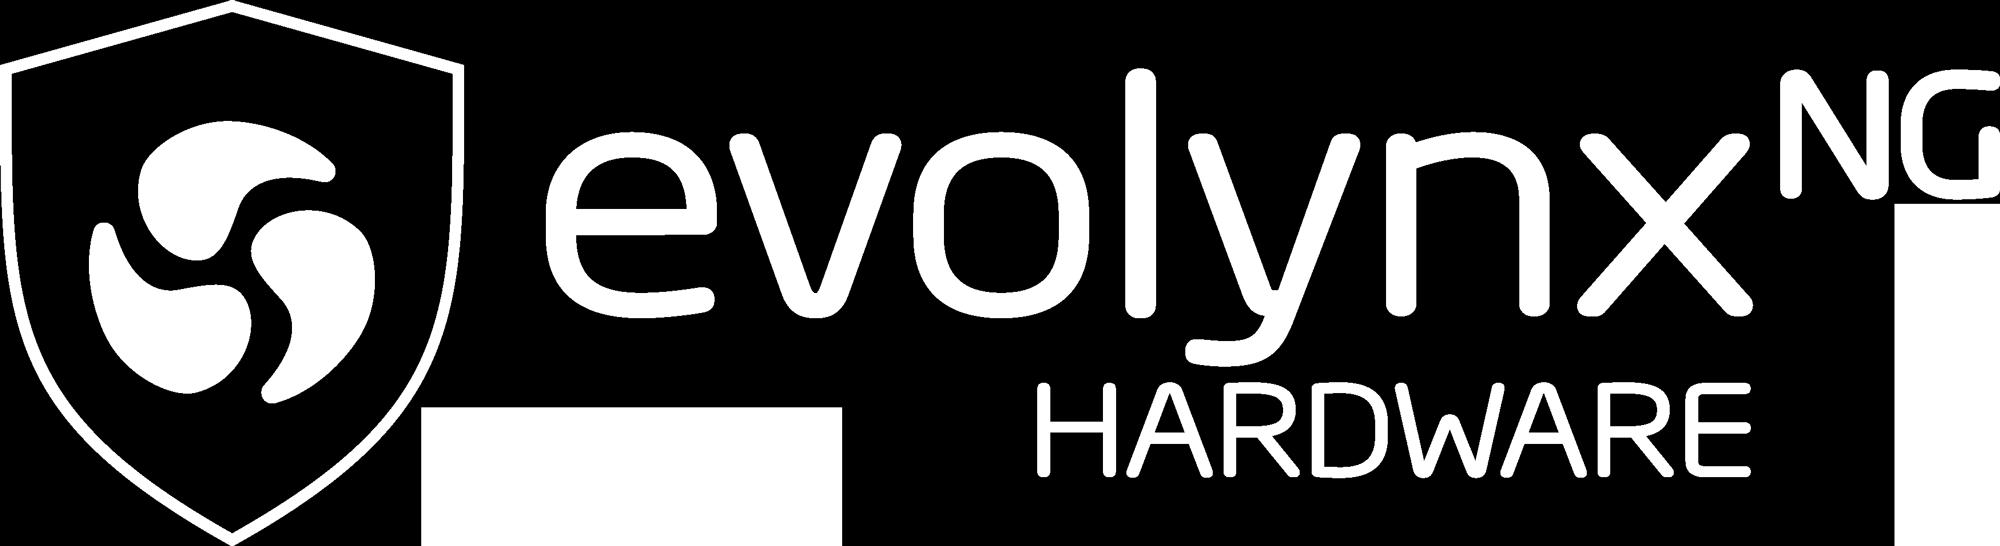 logo evolynxNG hardware